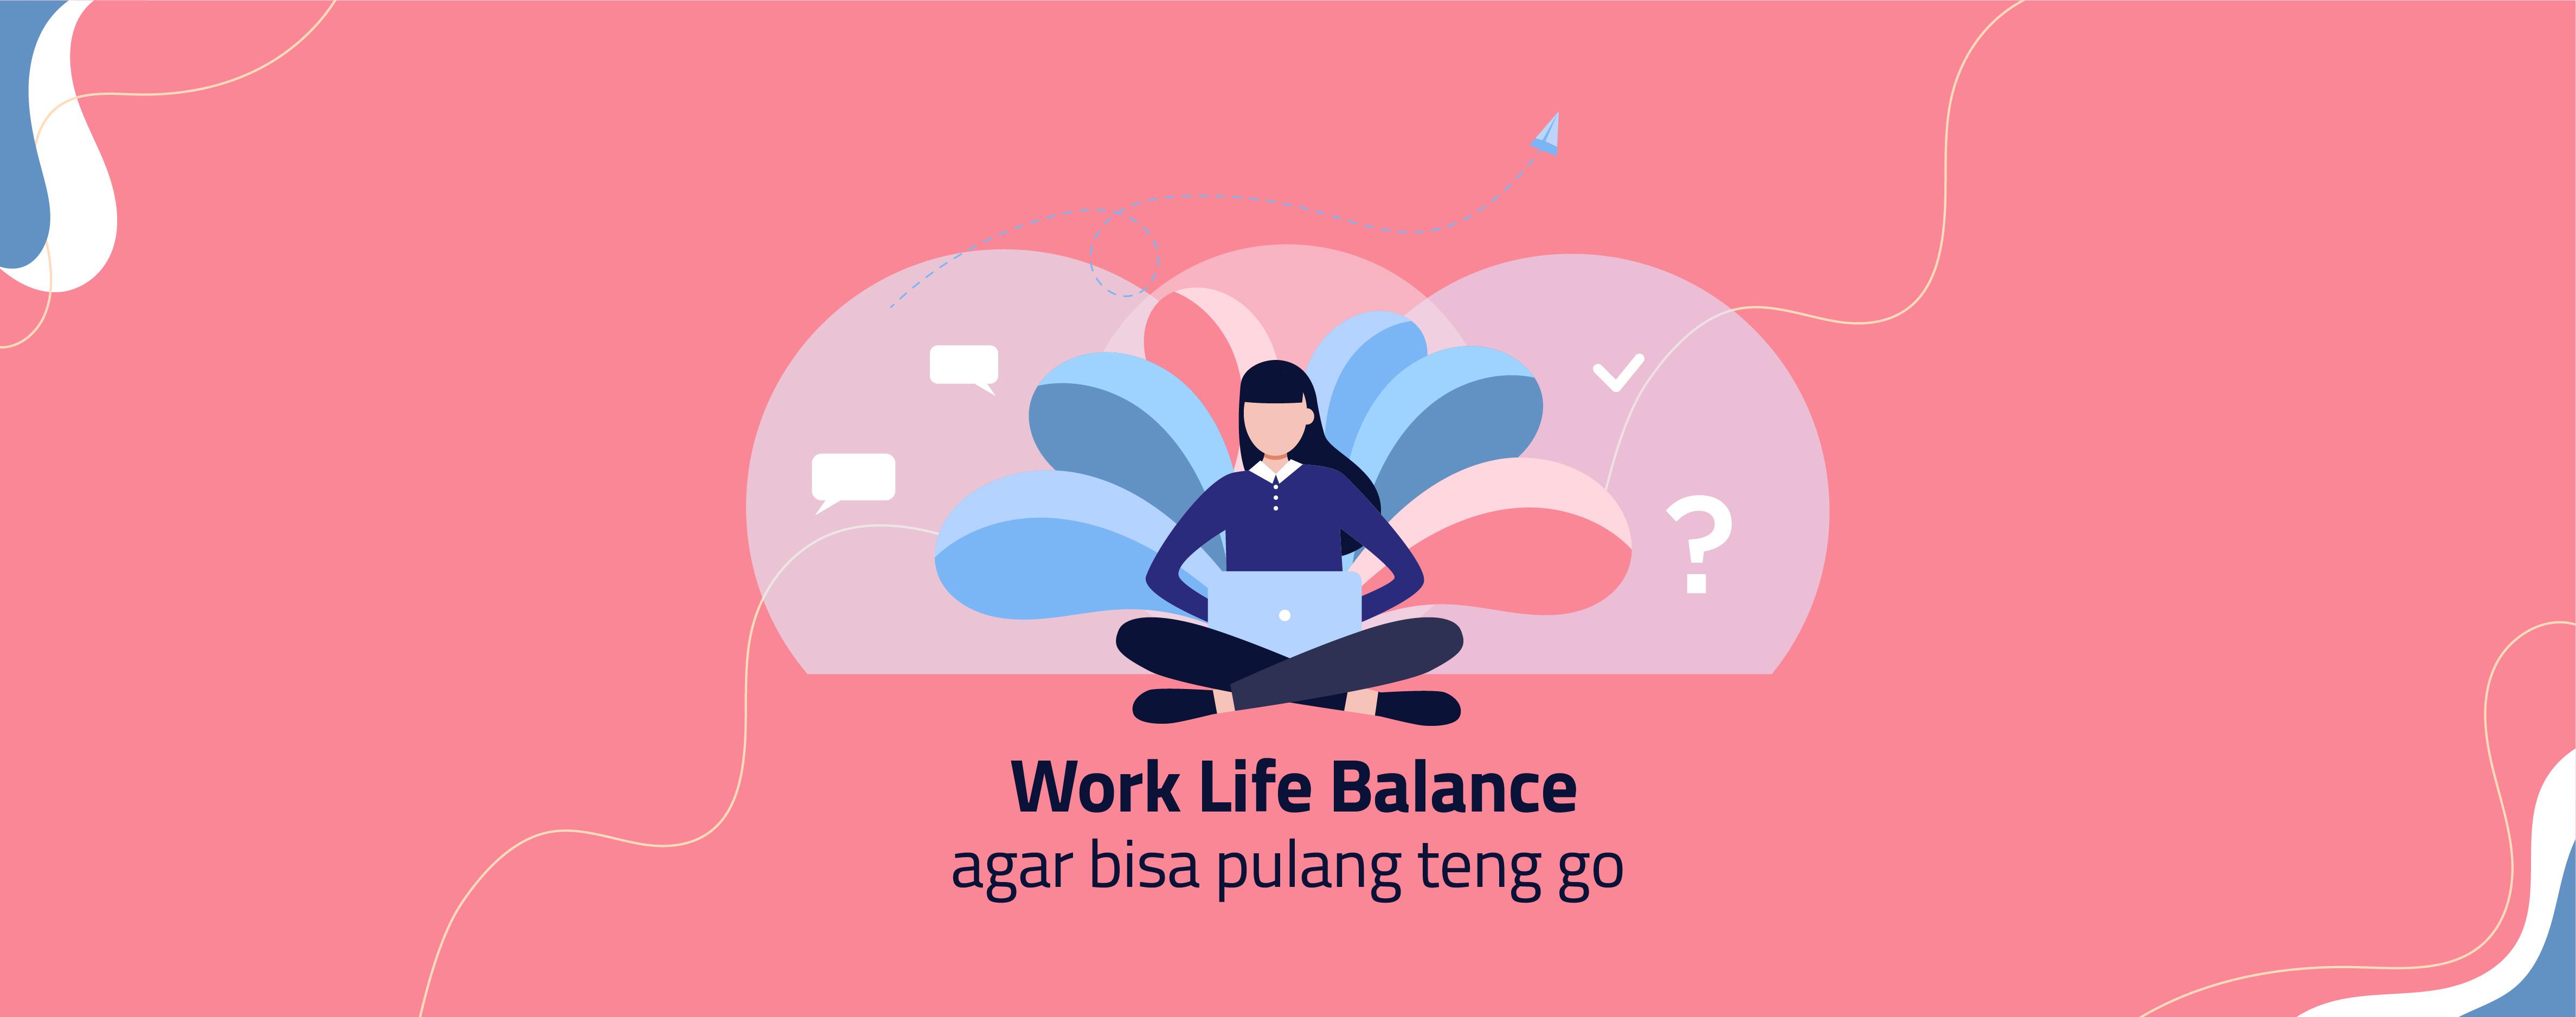 WORK LIFE BALANCE AGAR BISA PULANG TENG GO